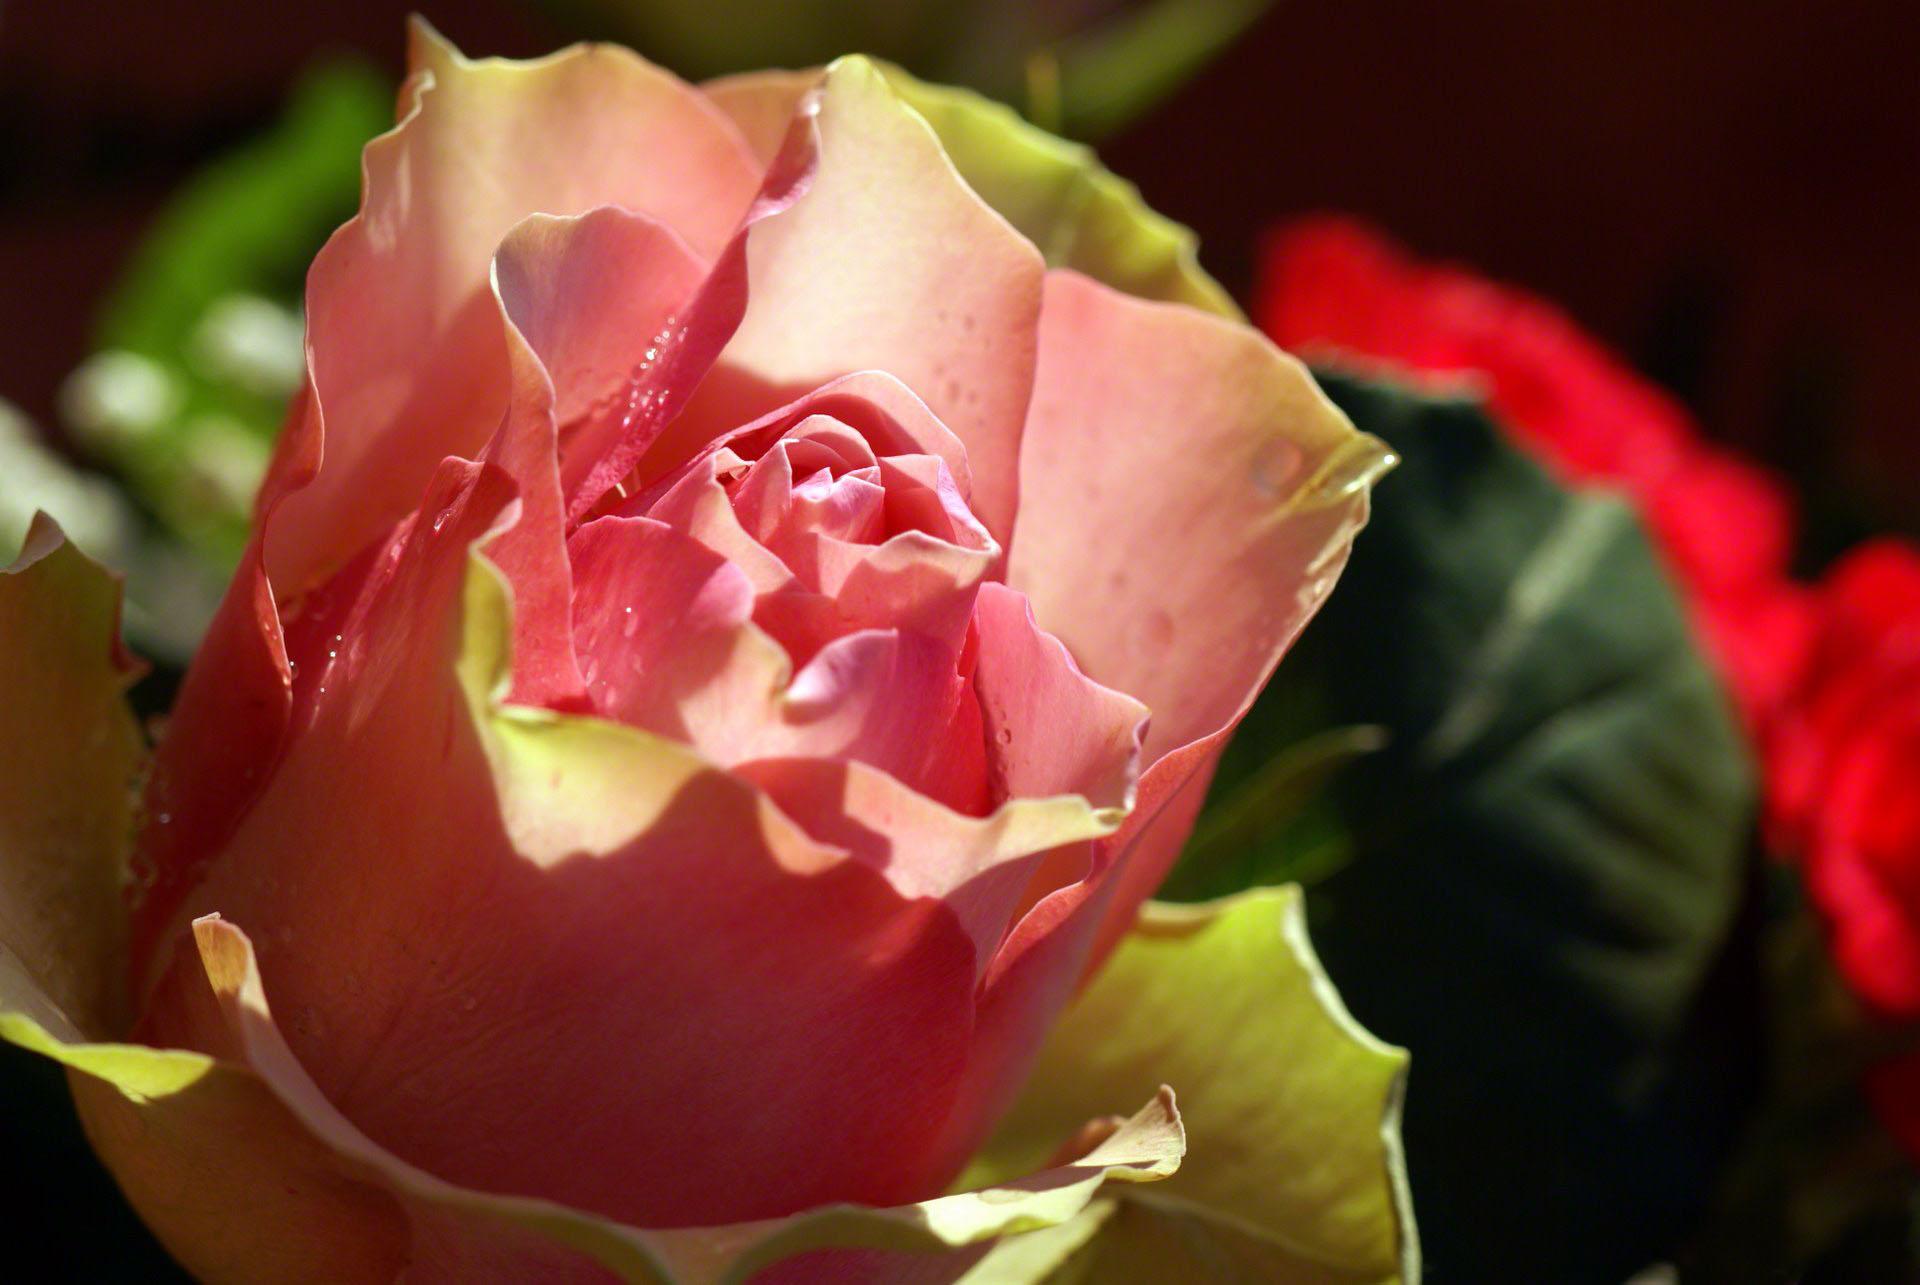 http://www.fabiovisentin.com/photography/photo/12/rose-macro-001.jpg